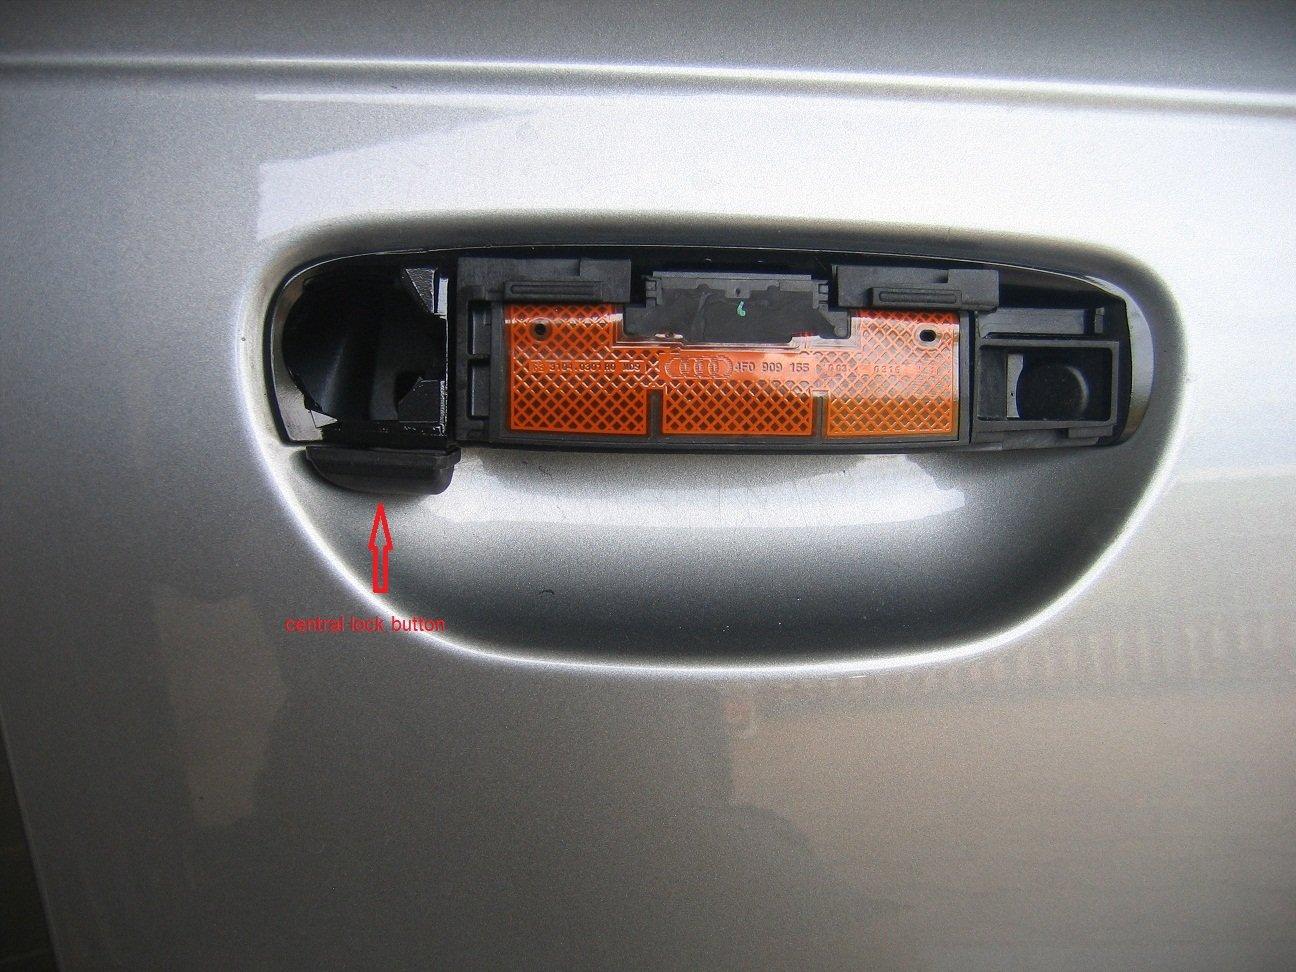 Retrofit of advanced key   Audi Forum